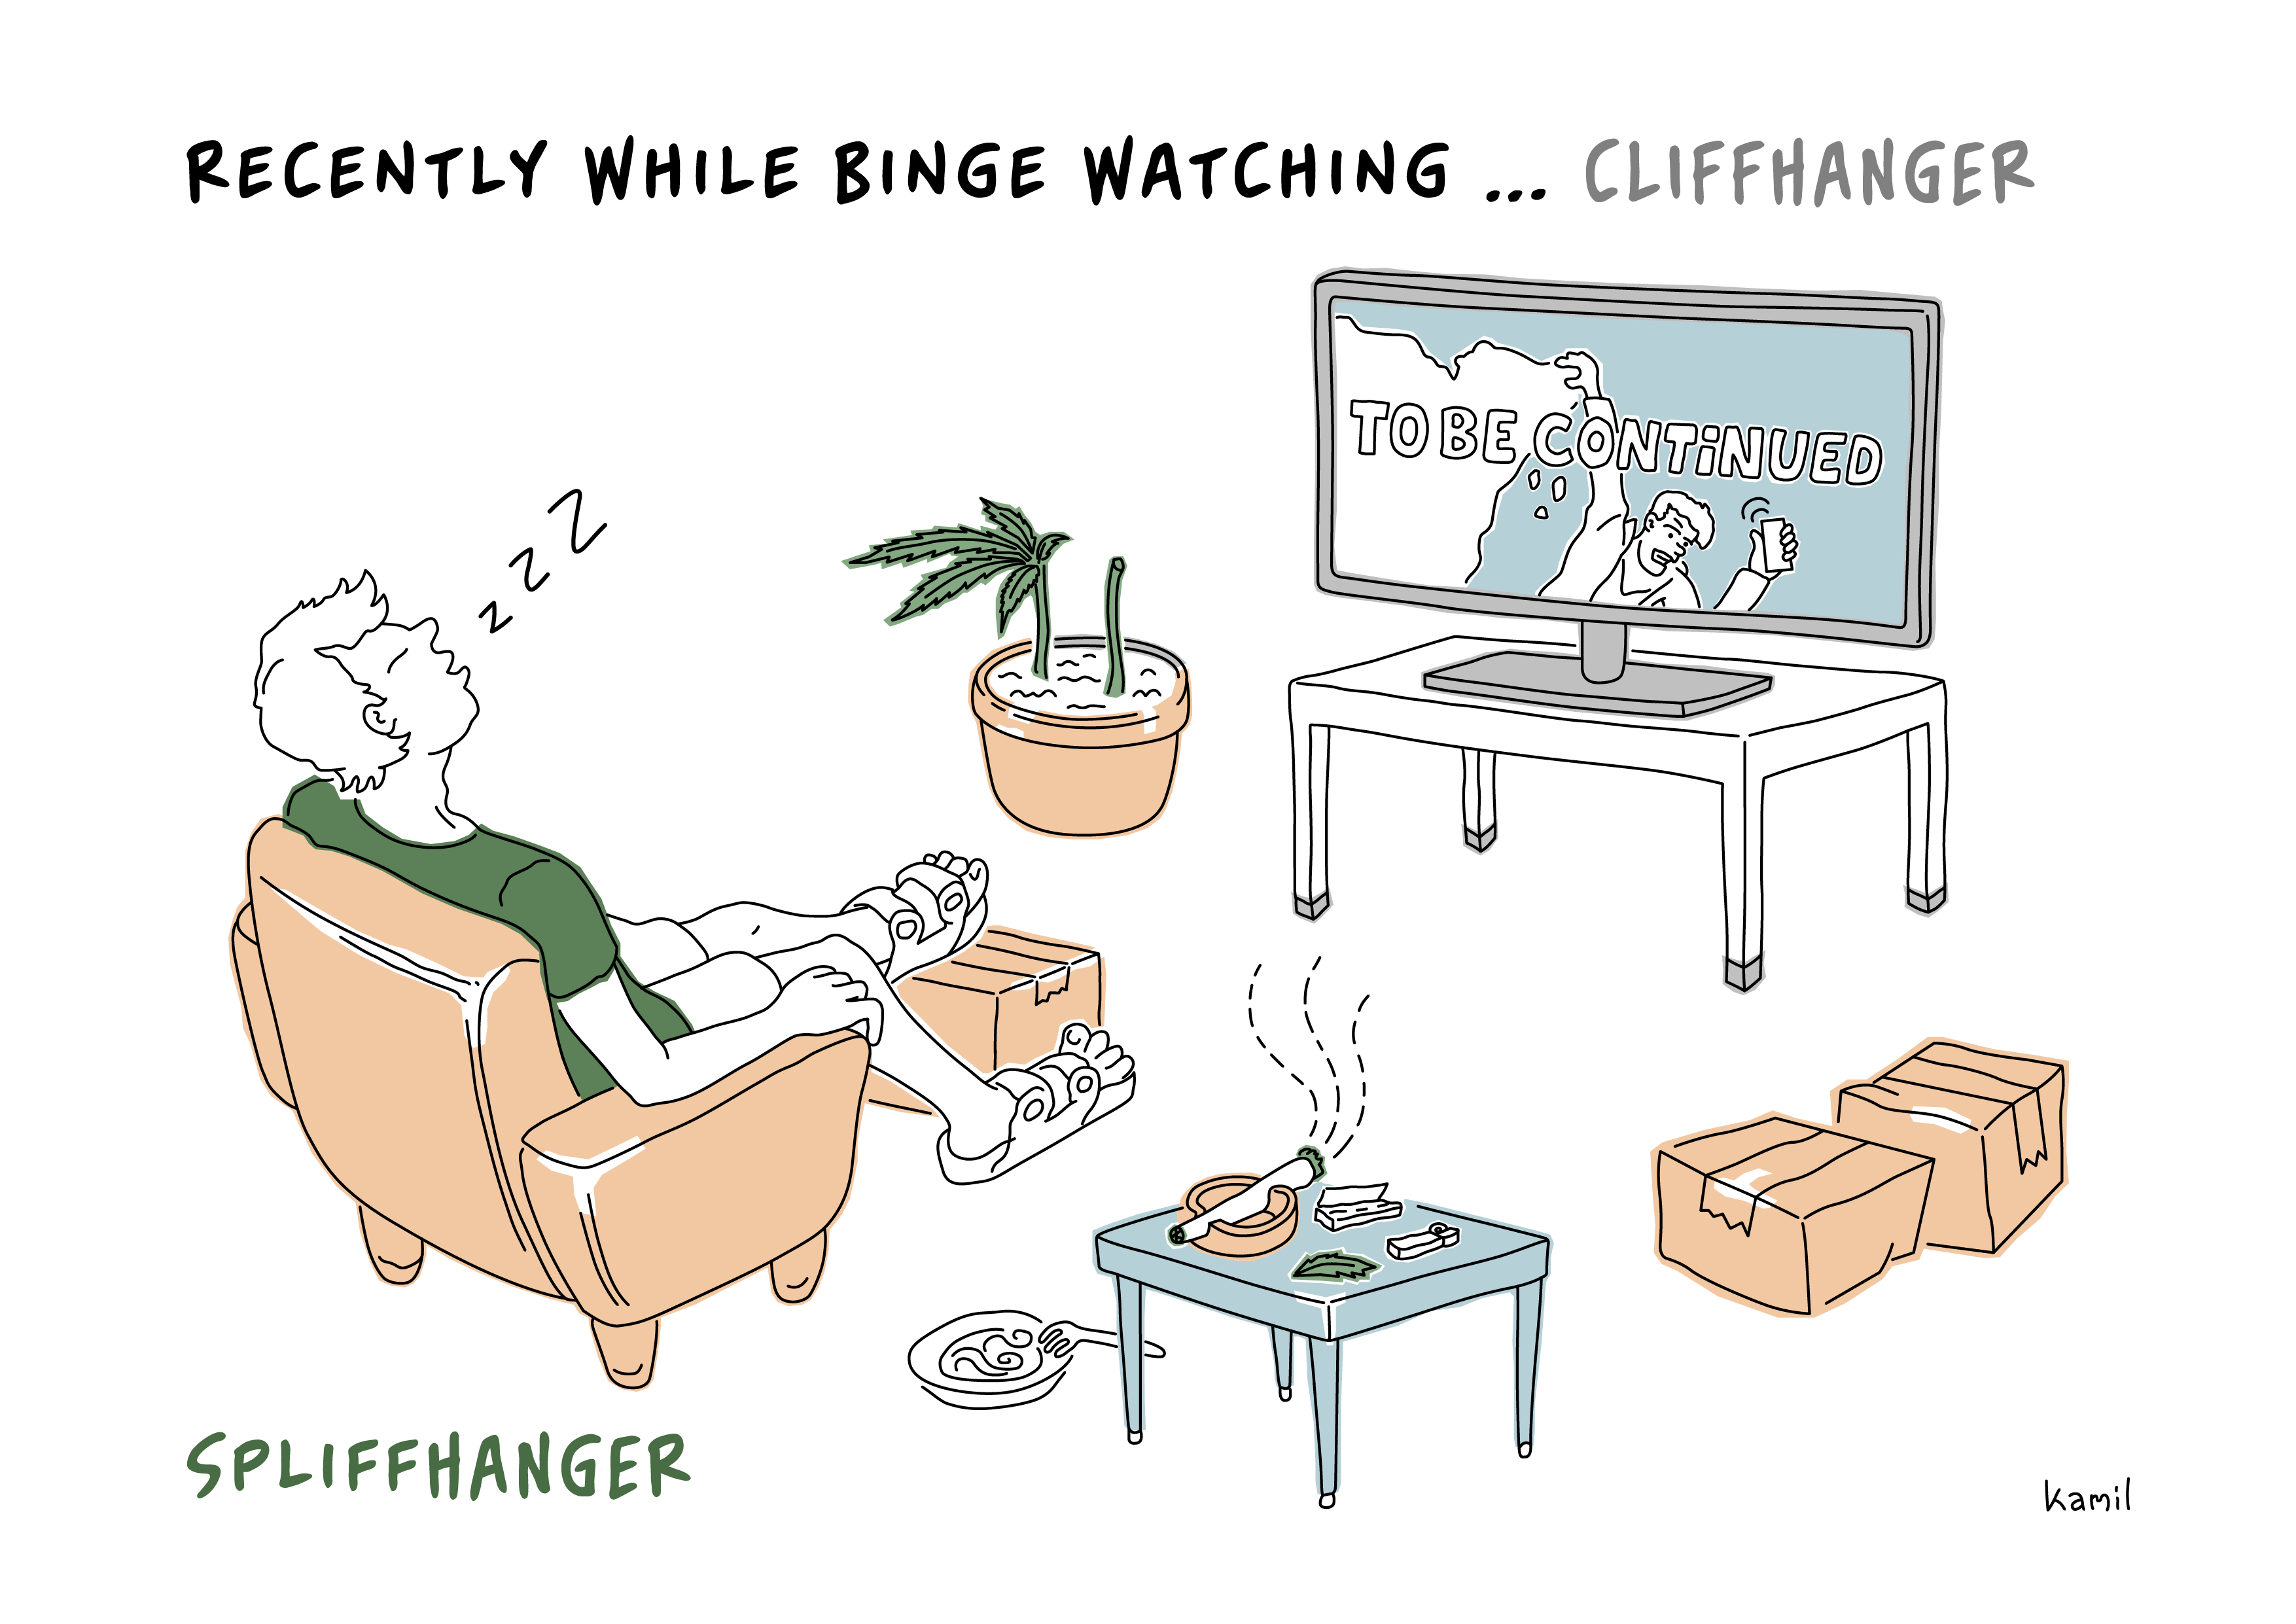 recently while binge watching cliffhanger spliffhanger